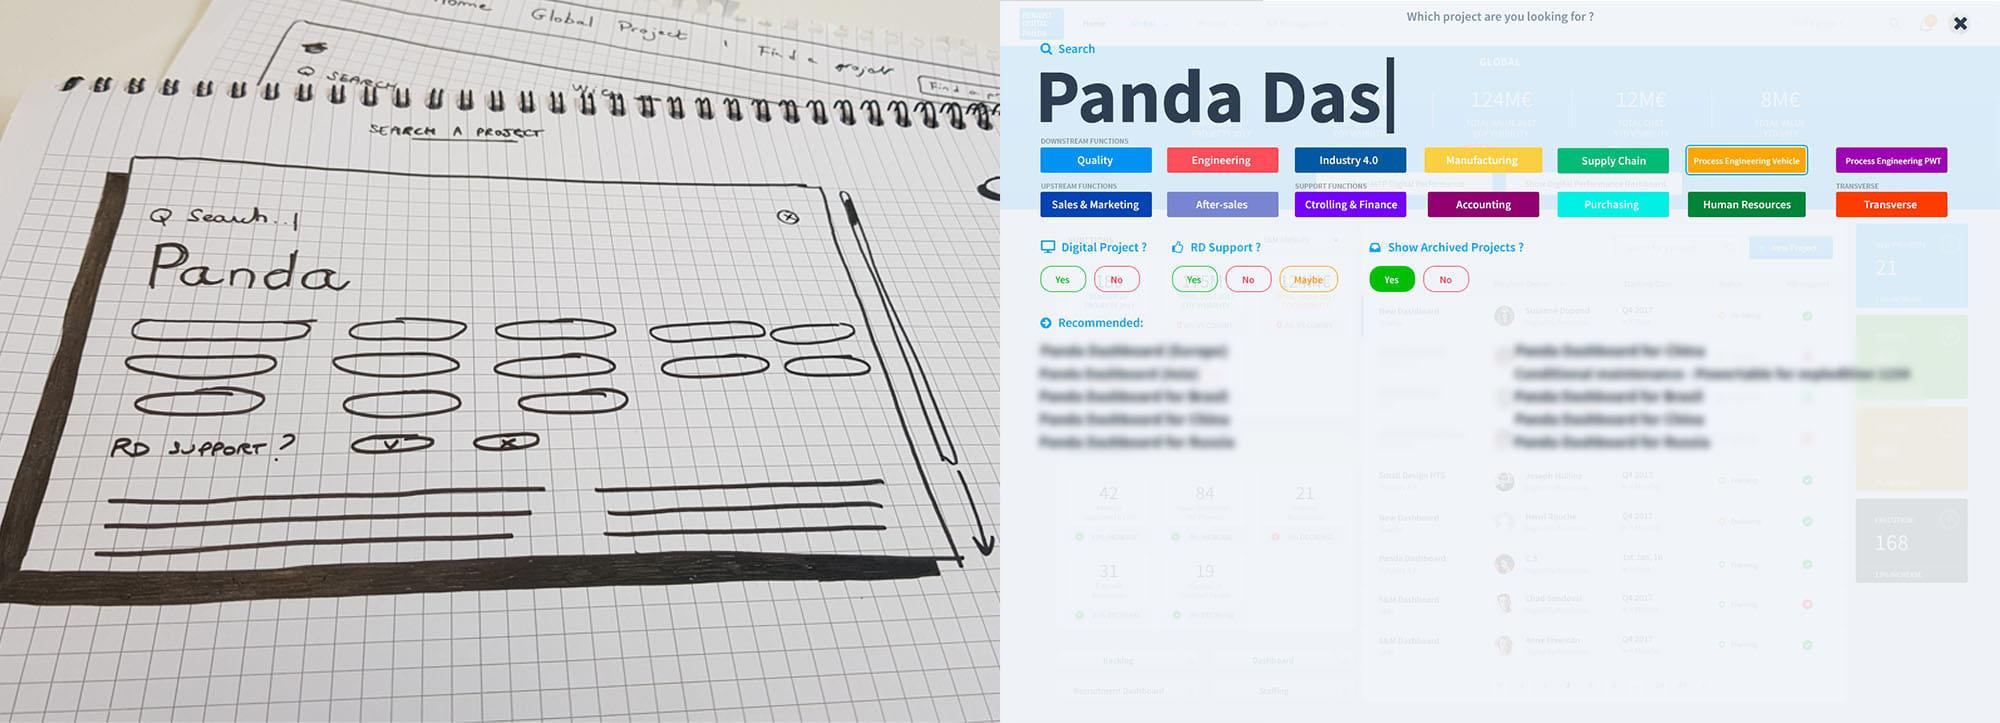 Panda-dashoard-ux-find-a-project-results-blurred